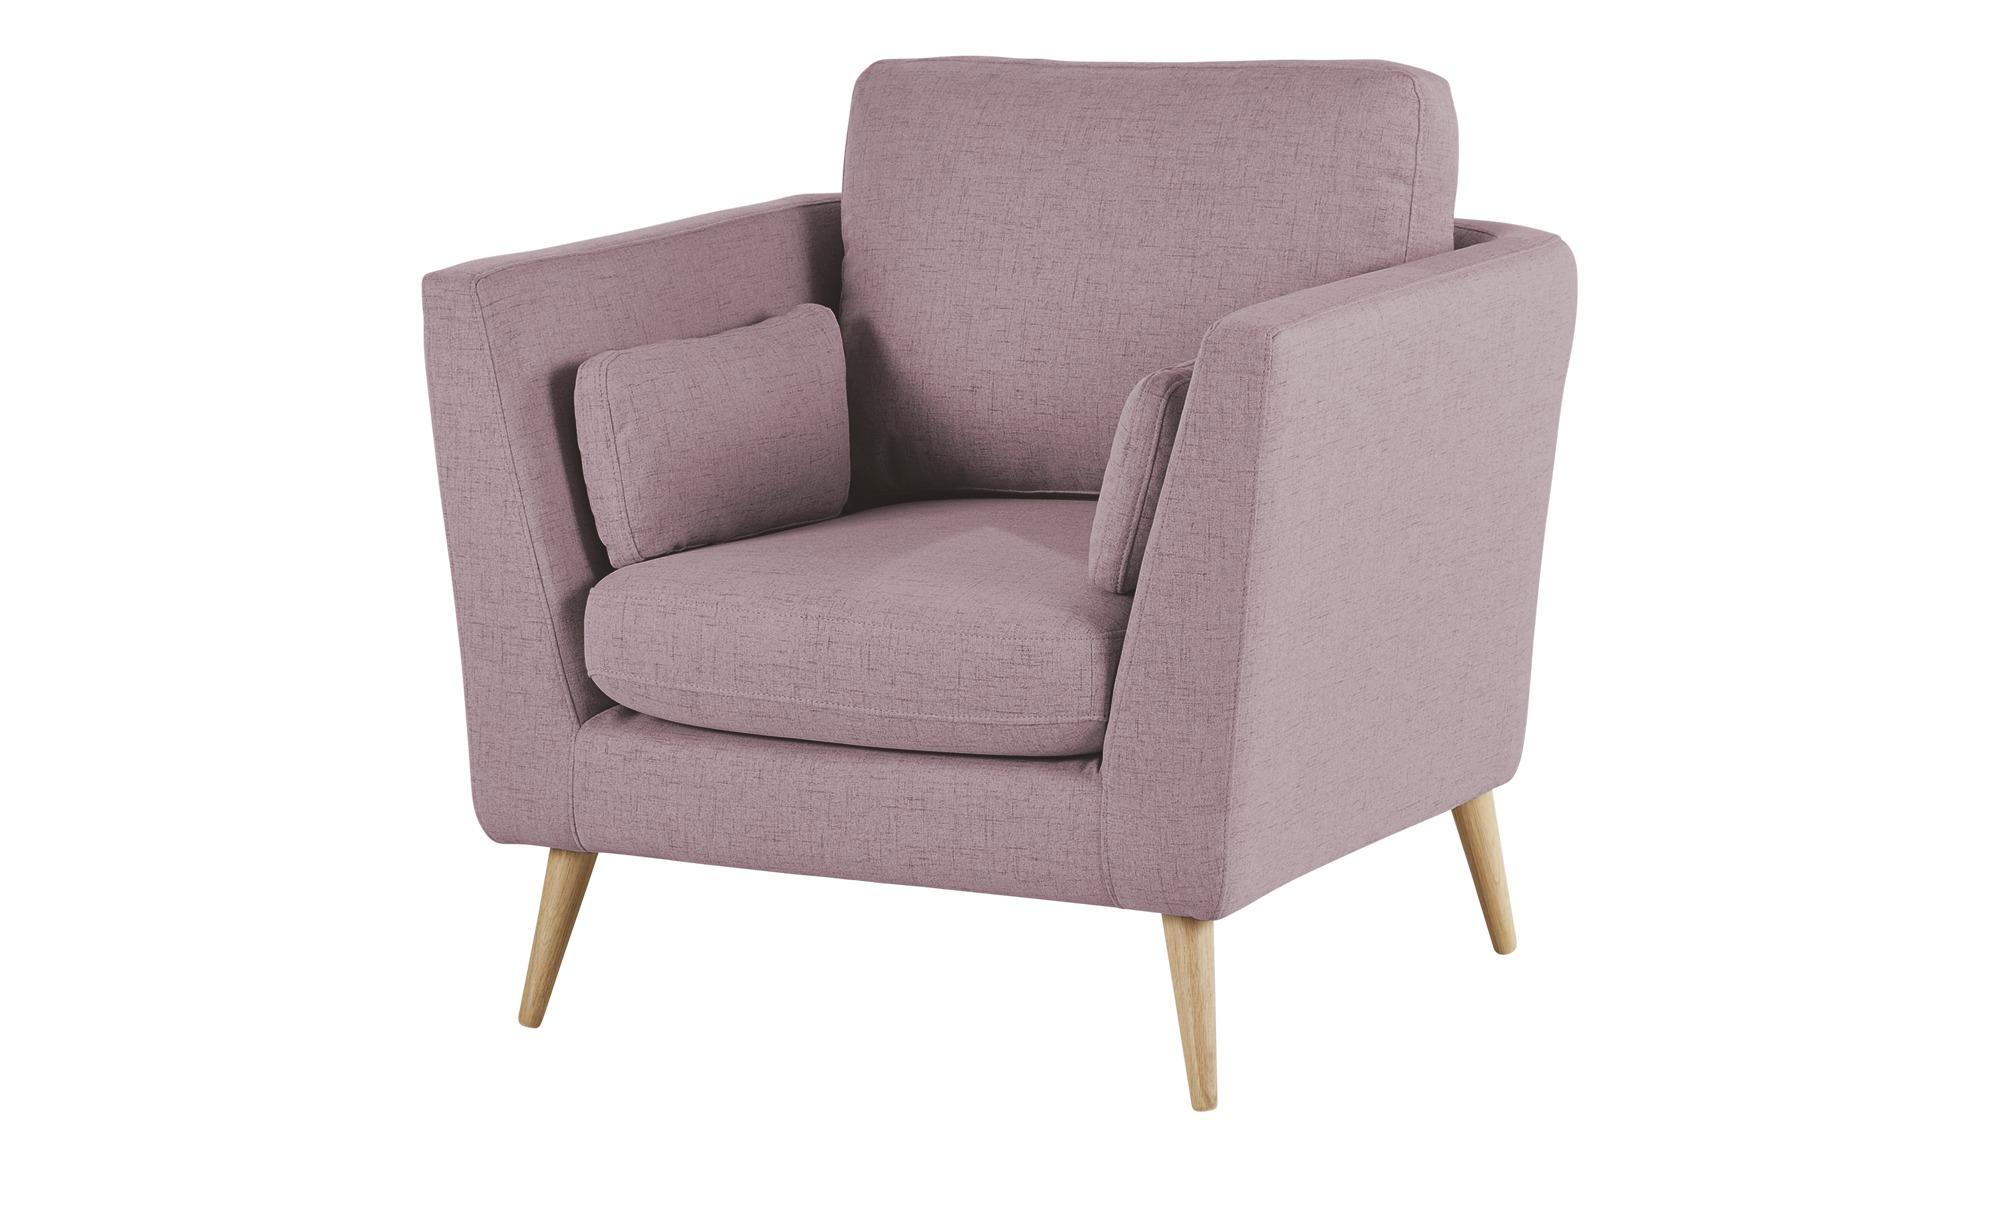 finya Skandi-Sessel rosa - Stoff Jane ¦ rosa/pink ¦ Maße (cm): B: 89 H: 92 T: 88 Polstermöbel > Sessel > Polstersessel - Höffner